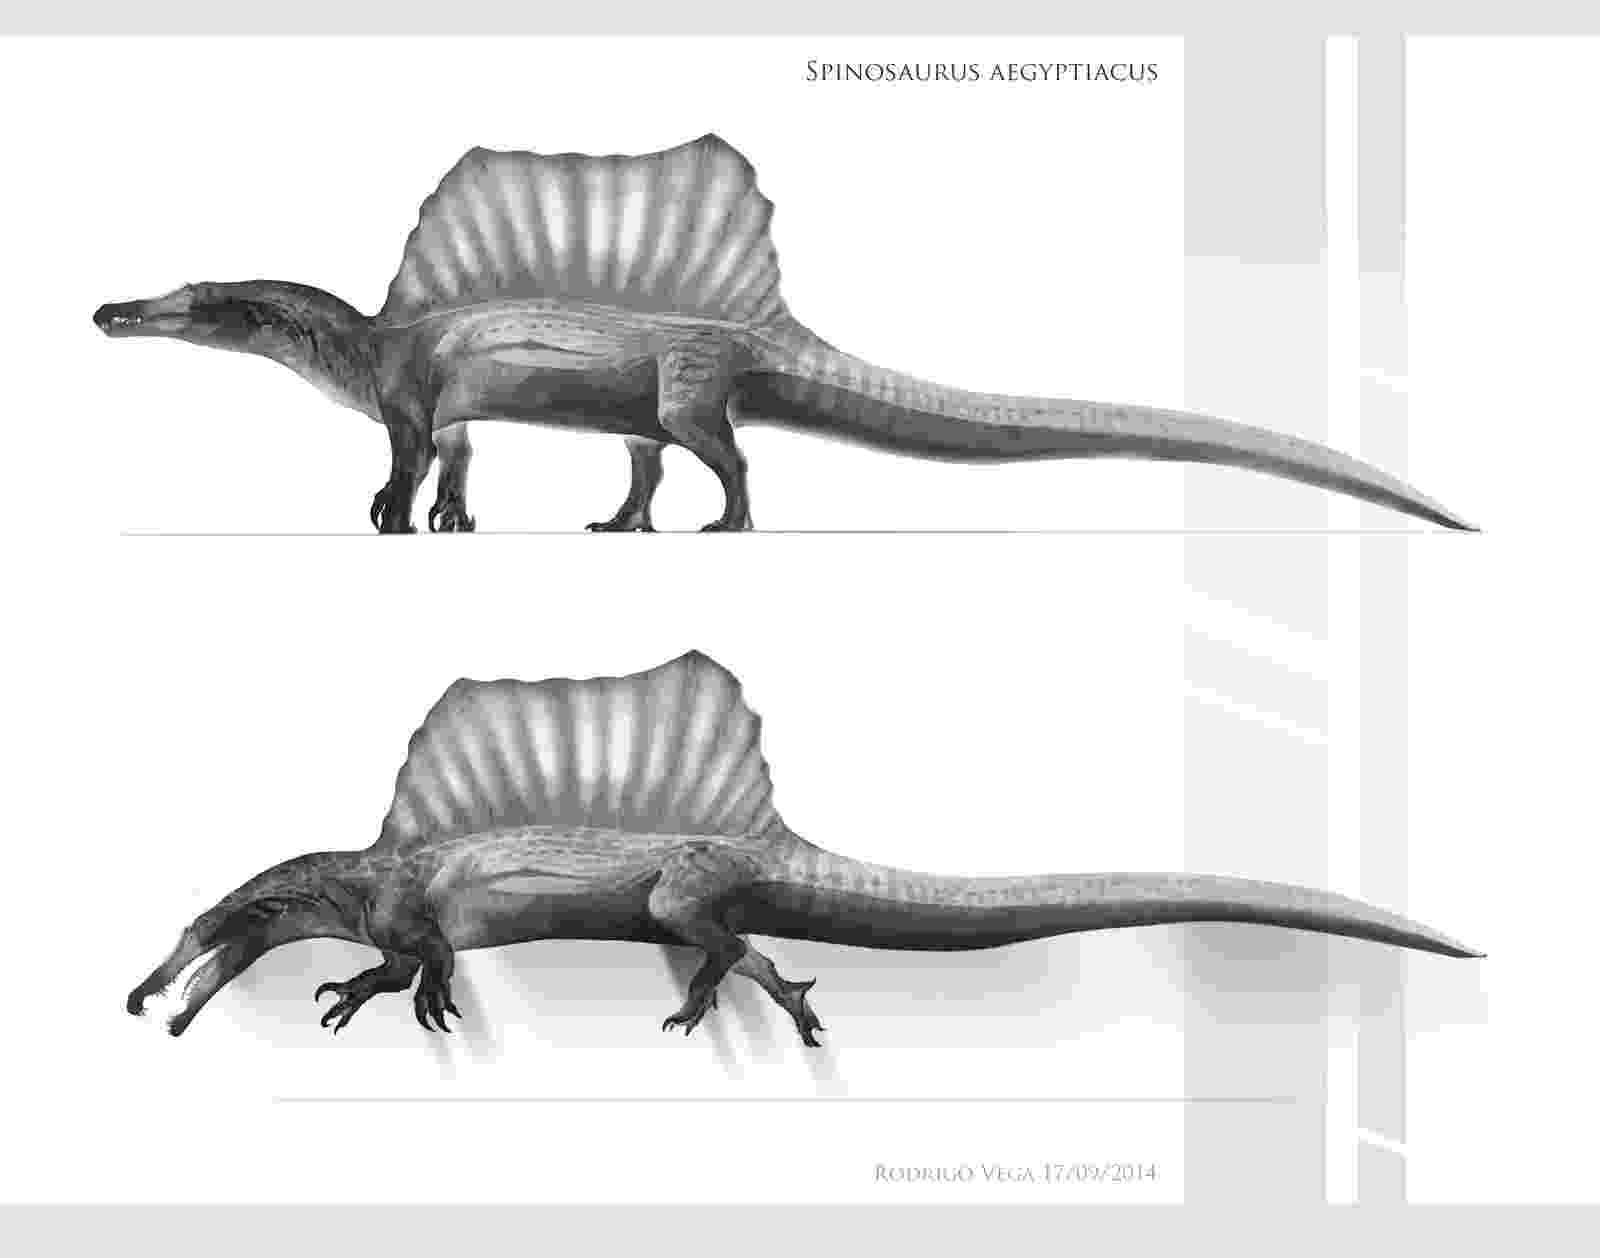 spinosaurus pictures spinosaurus aegyptiacus pictorial dinosaur archives pictures spinosaurus